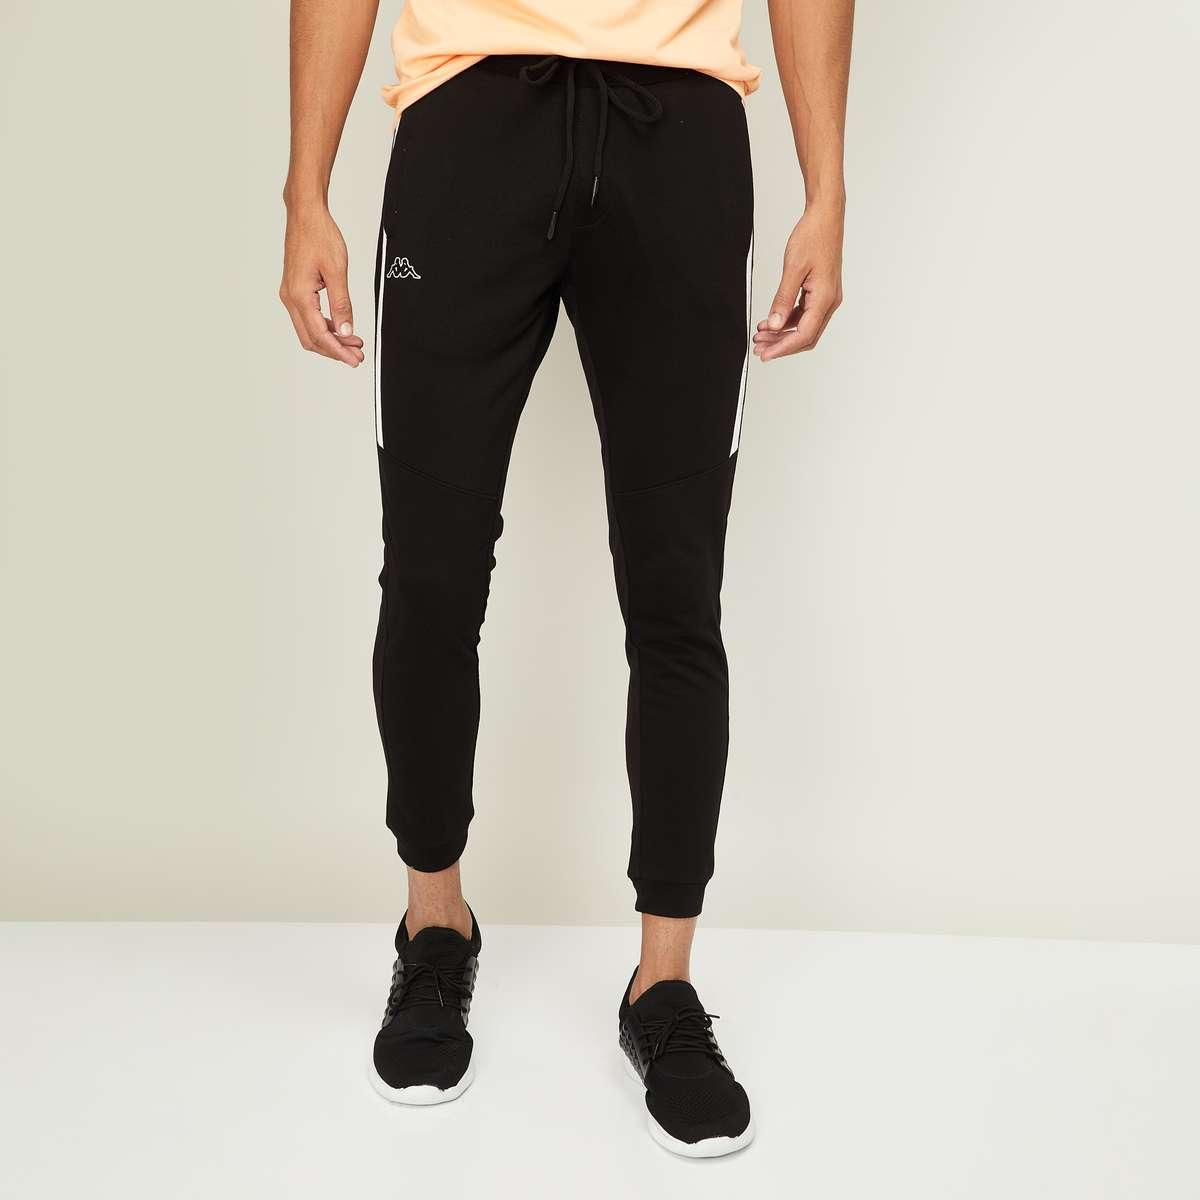 9.KAPPA Men Solid Slim Fit Elasticated Joggers